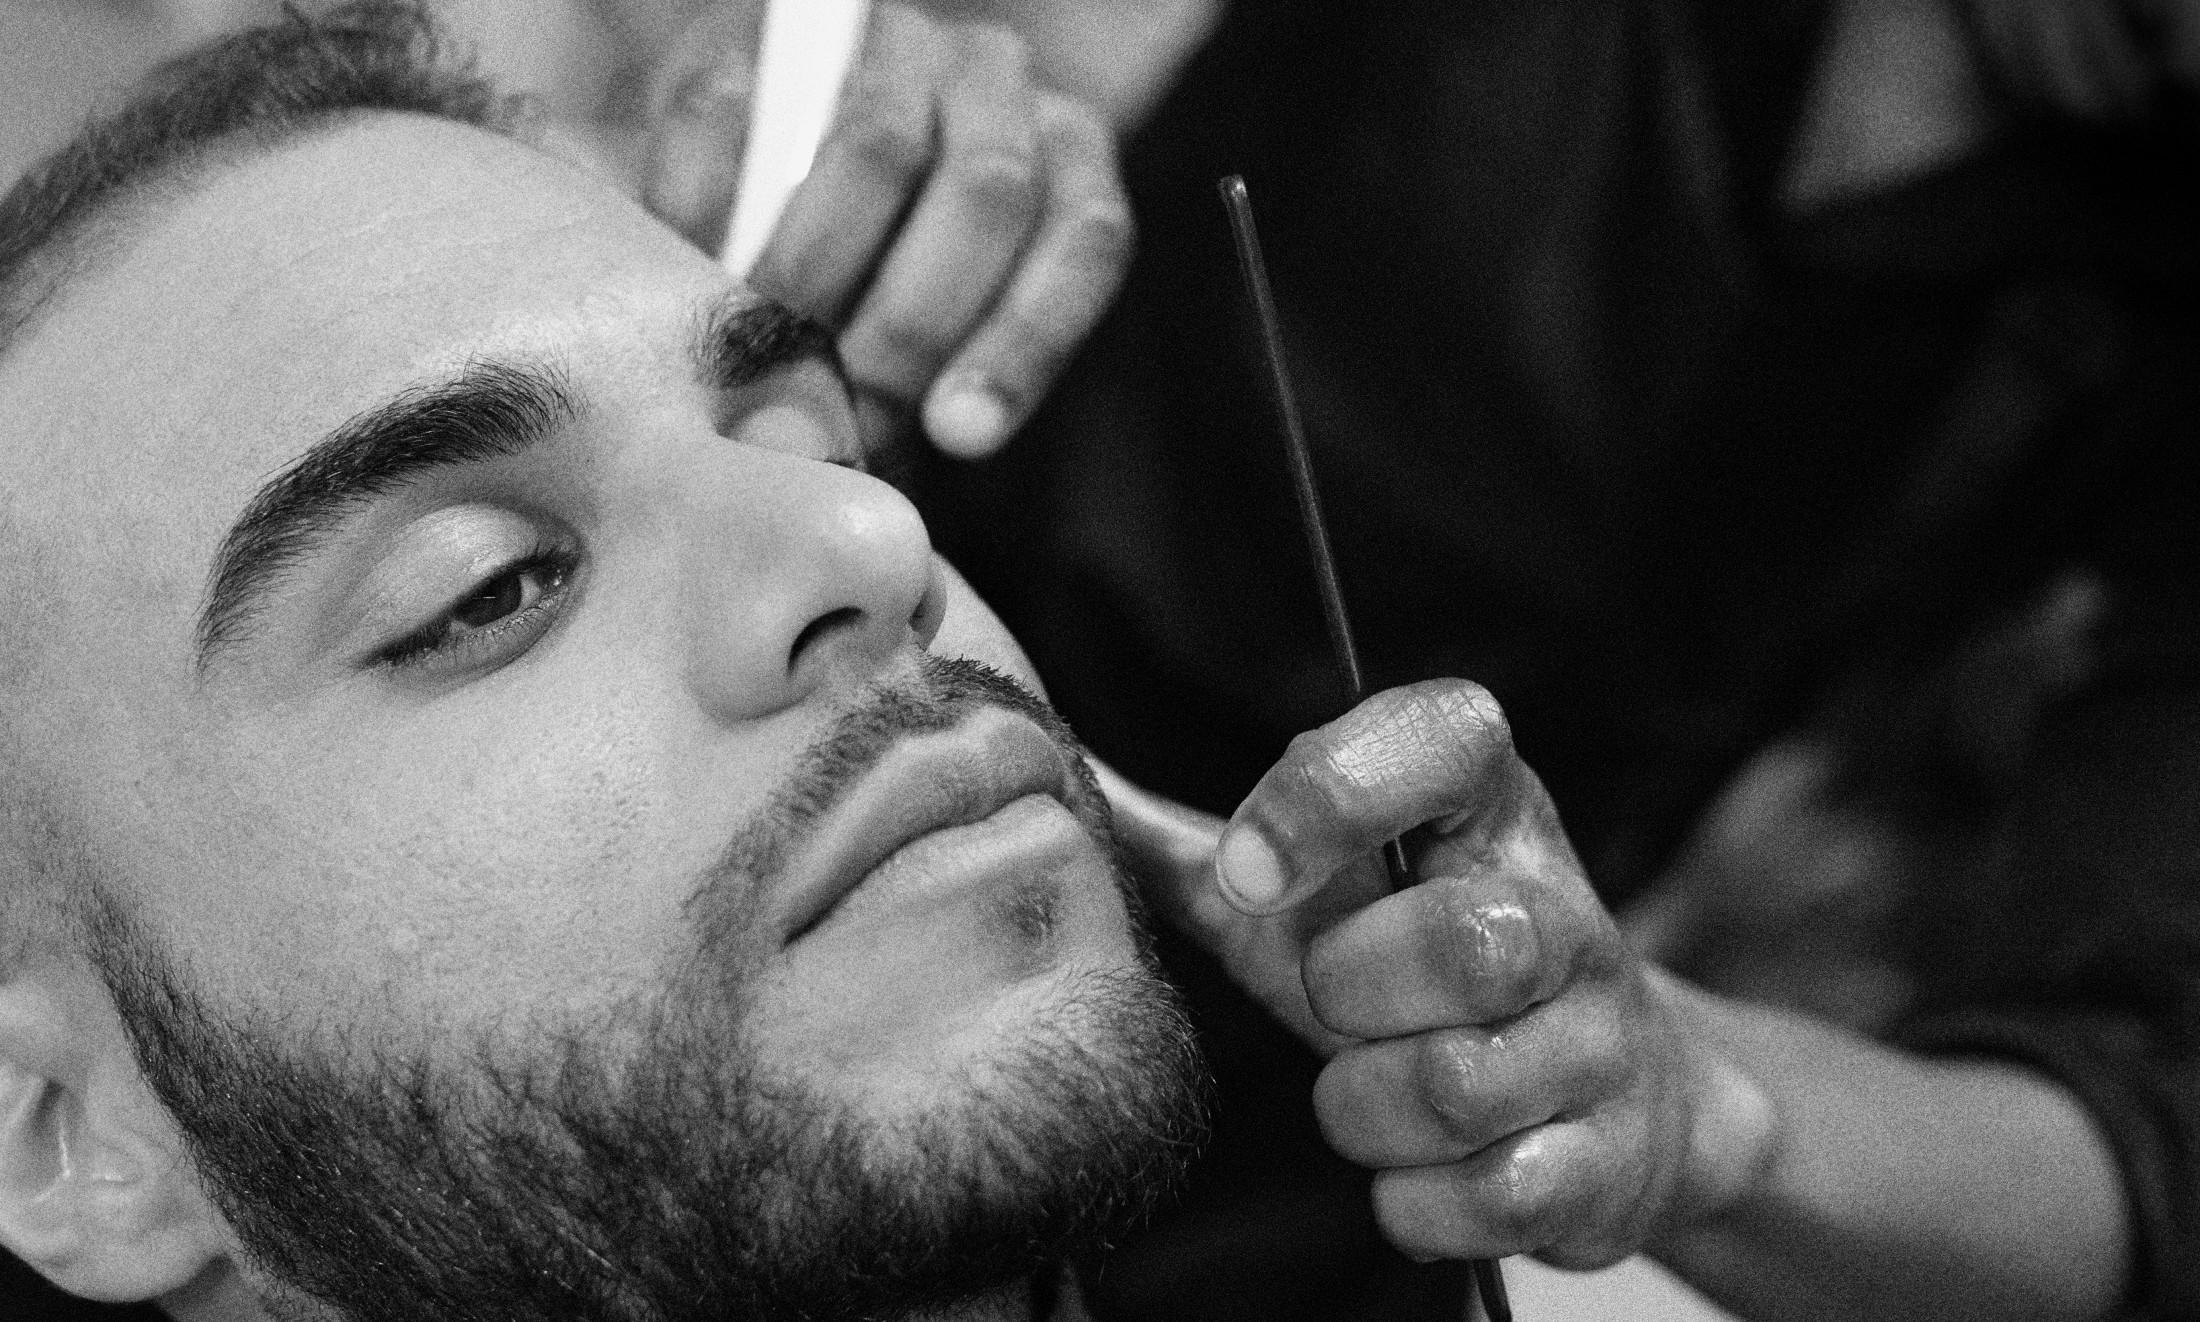 manbitious hair oils, beard oils, promoclip door karsten missot